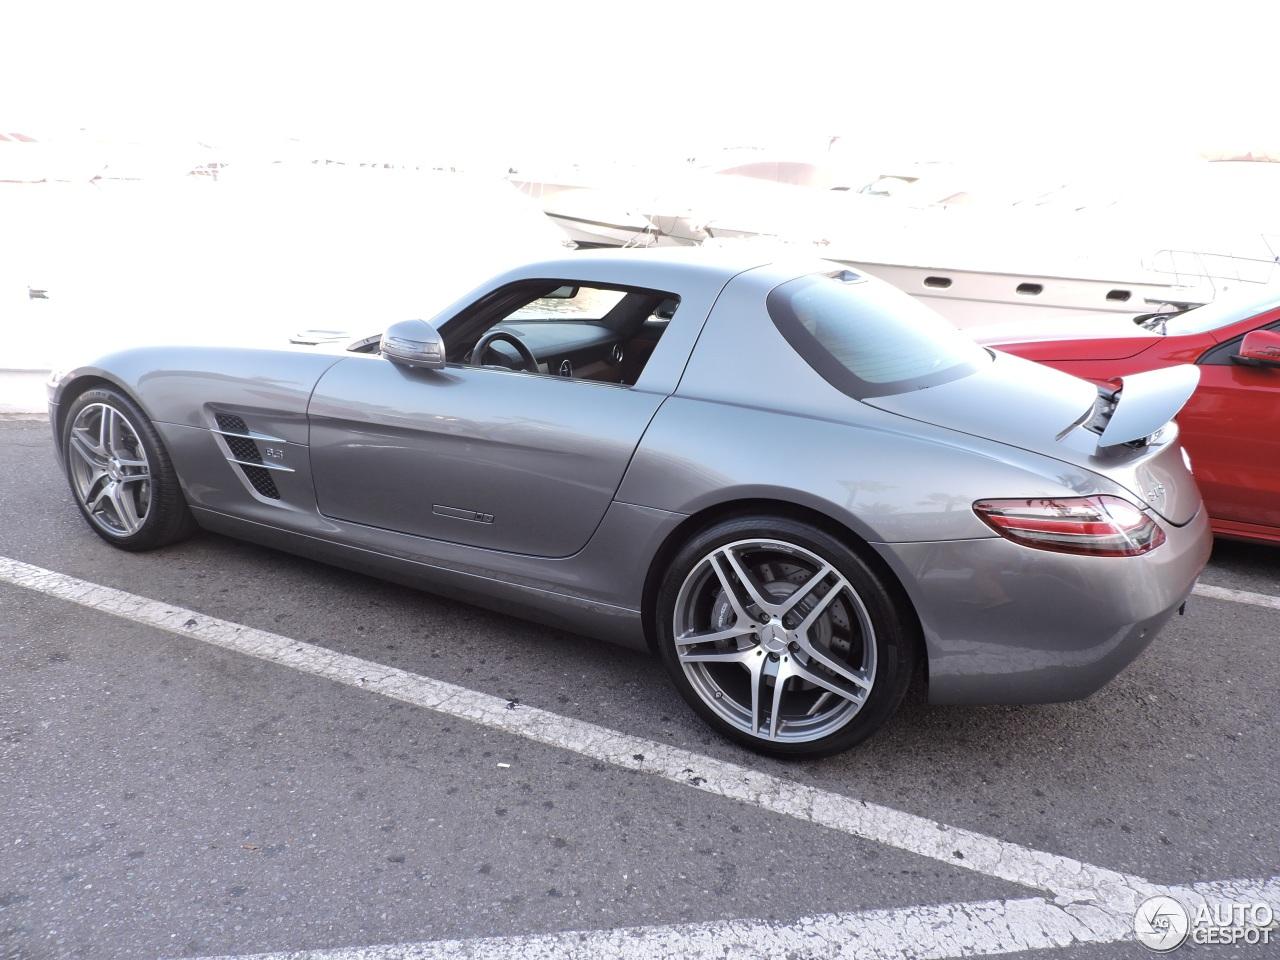 Mercedes benz sls amg 15 november 2016 autogespot for Mercedes benz slr amg price